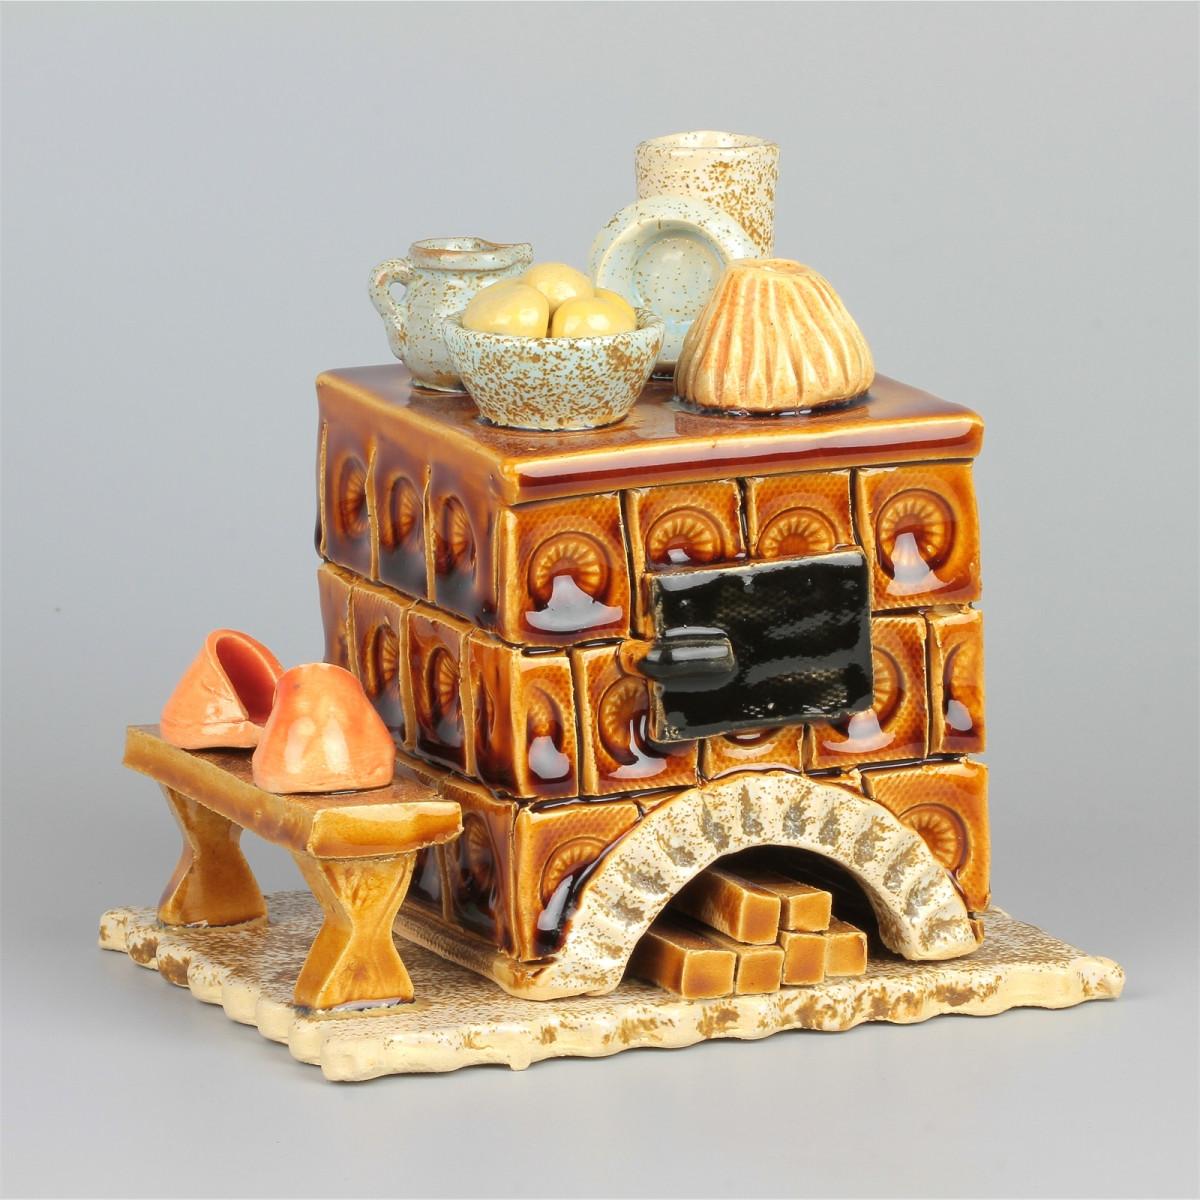 keramik r ucherofen braun eckig klein erzgebirgskunst drechsel. Black Bedroom Furniture Sets. Home Design Ideas